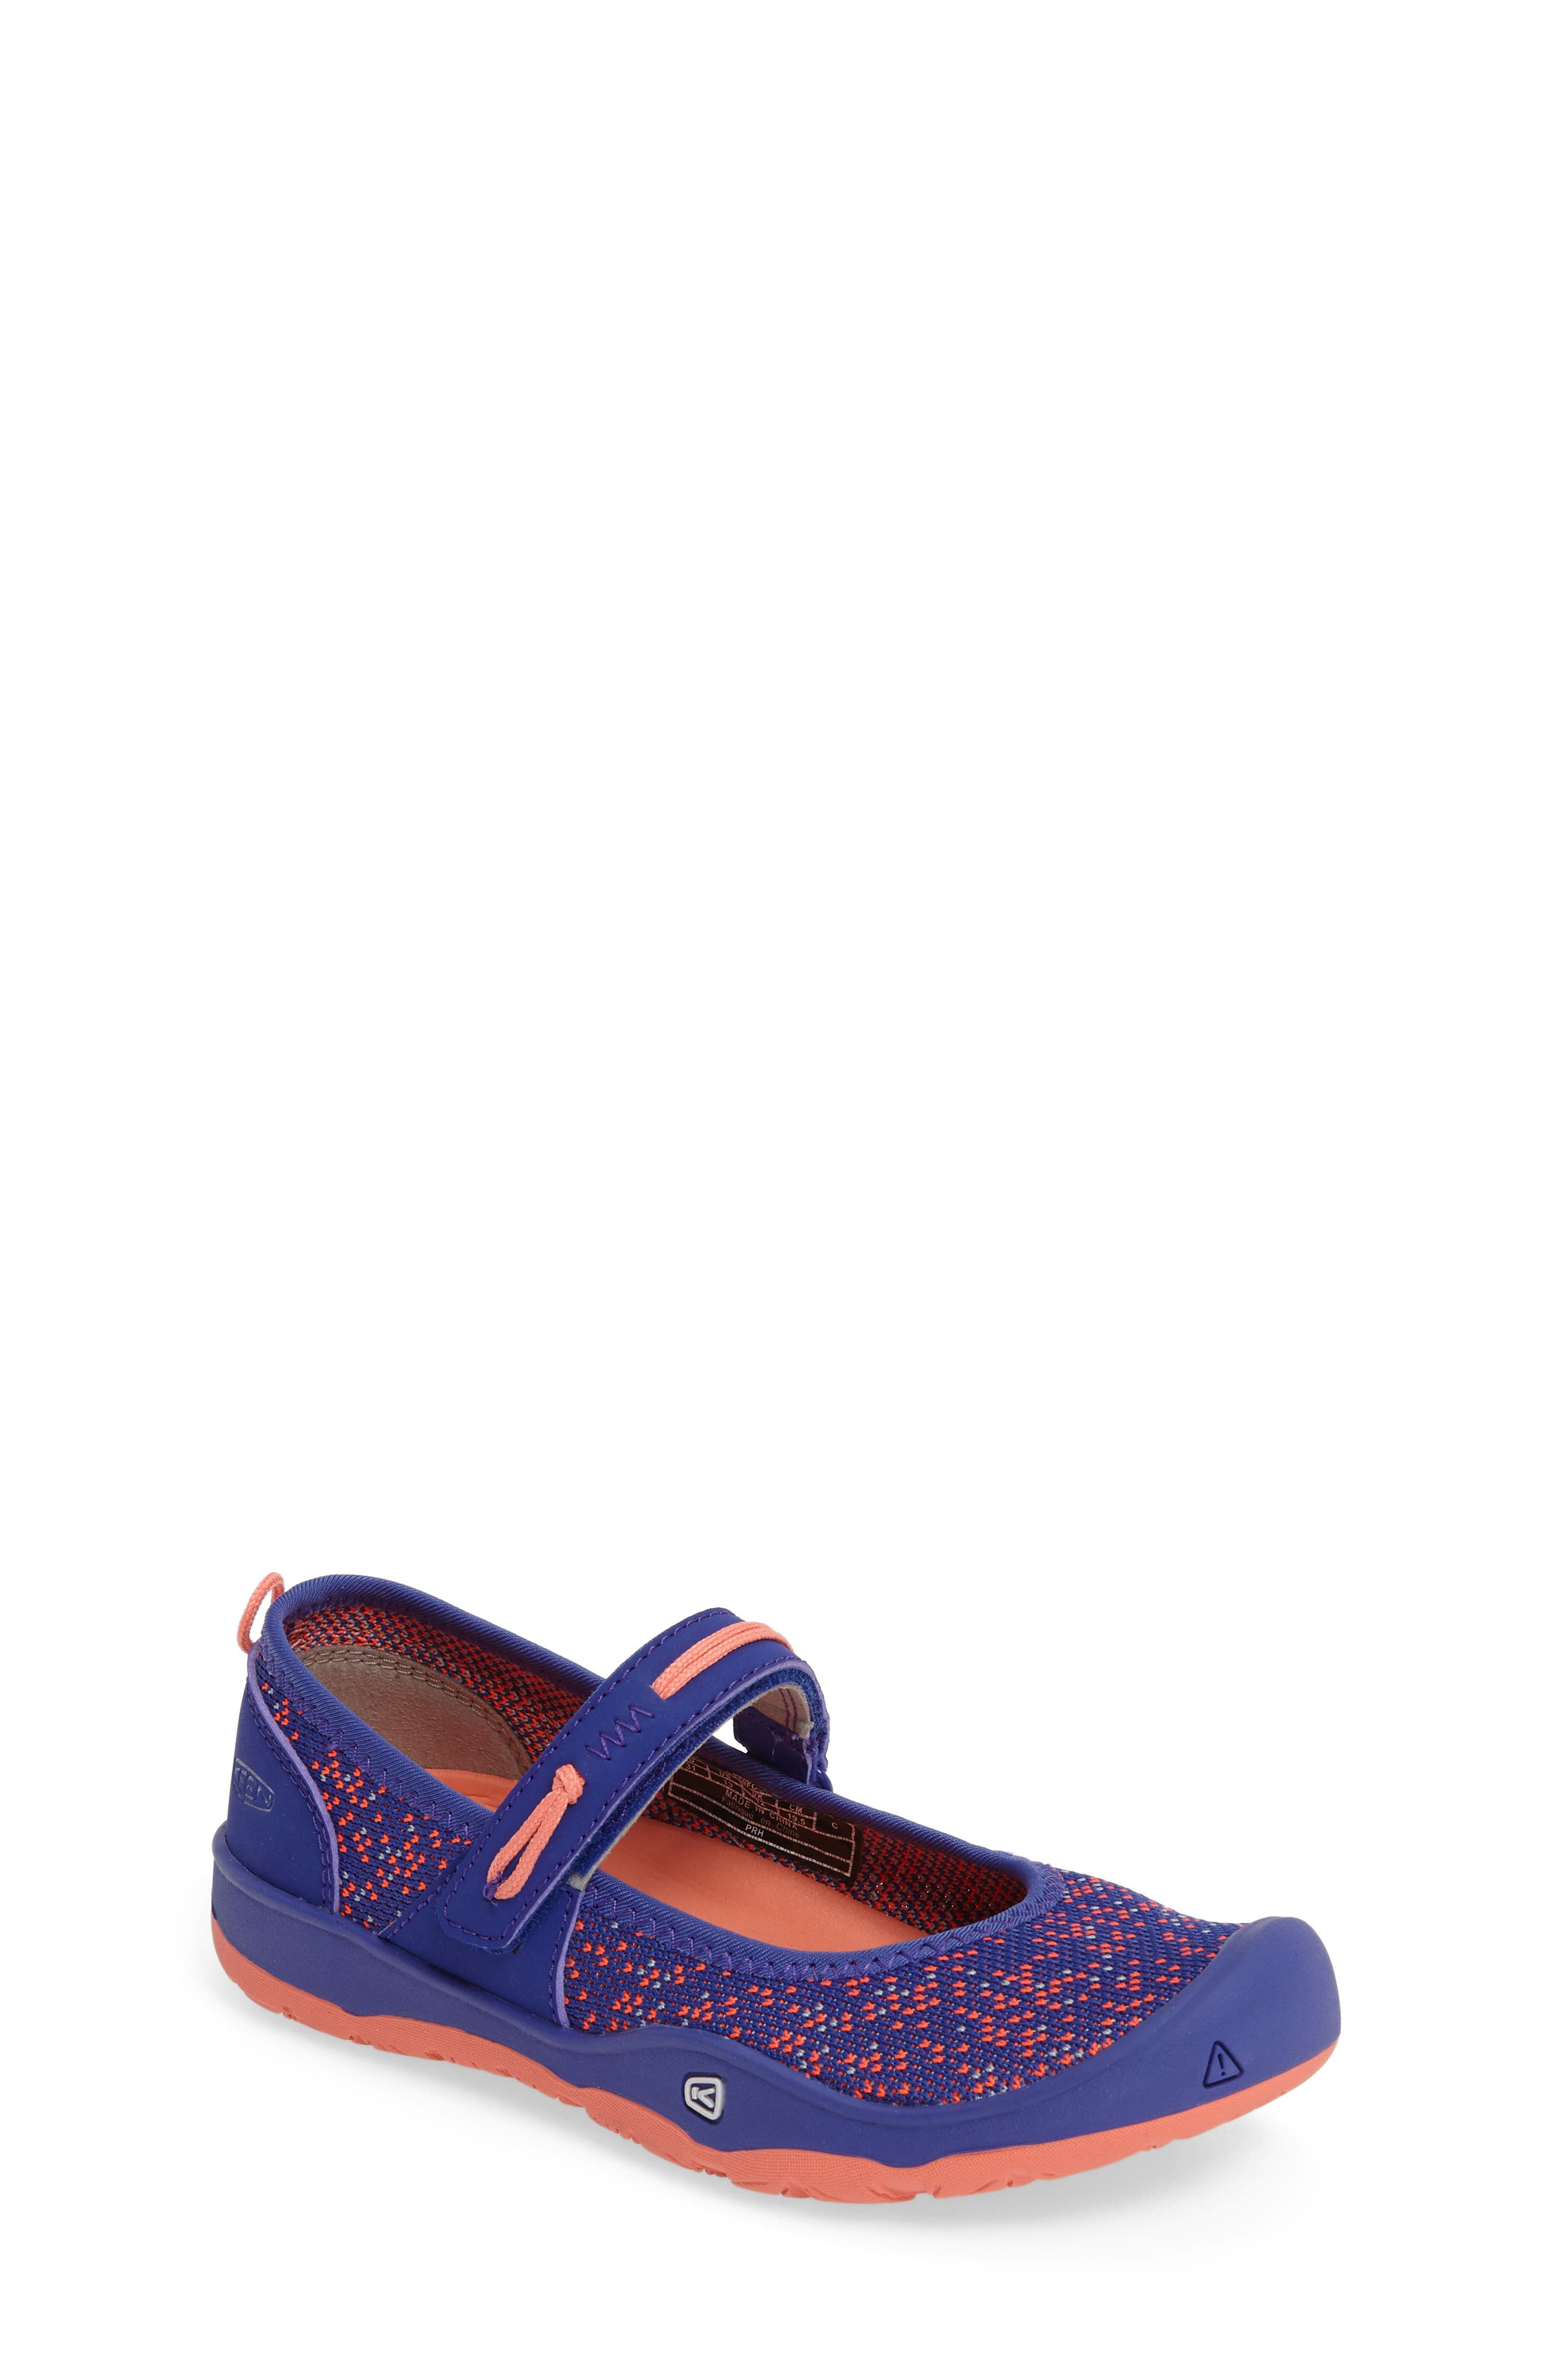 Moxie Mary Jane,                         Main,                         color, Purple/ Fusion Coral